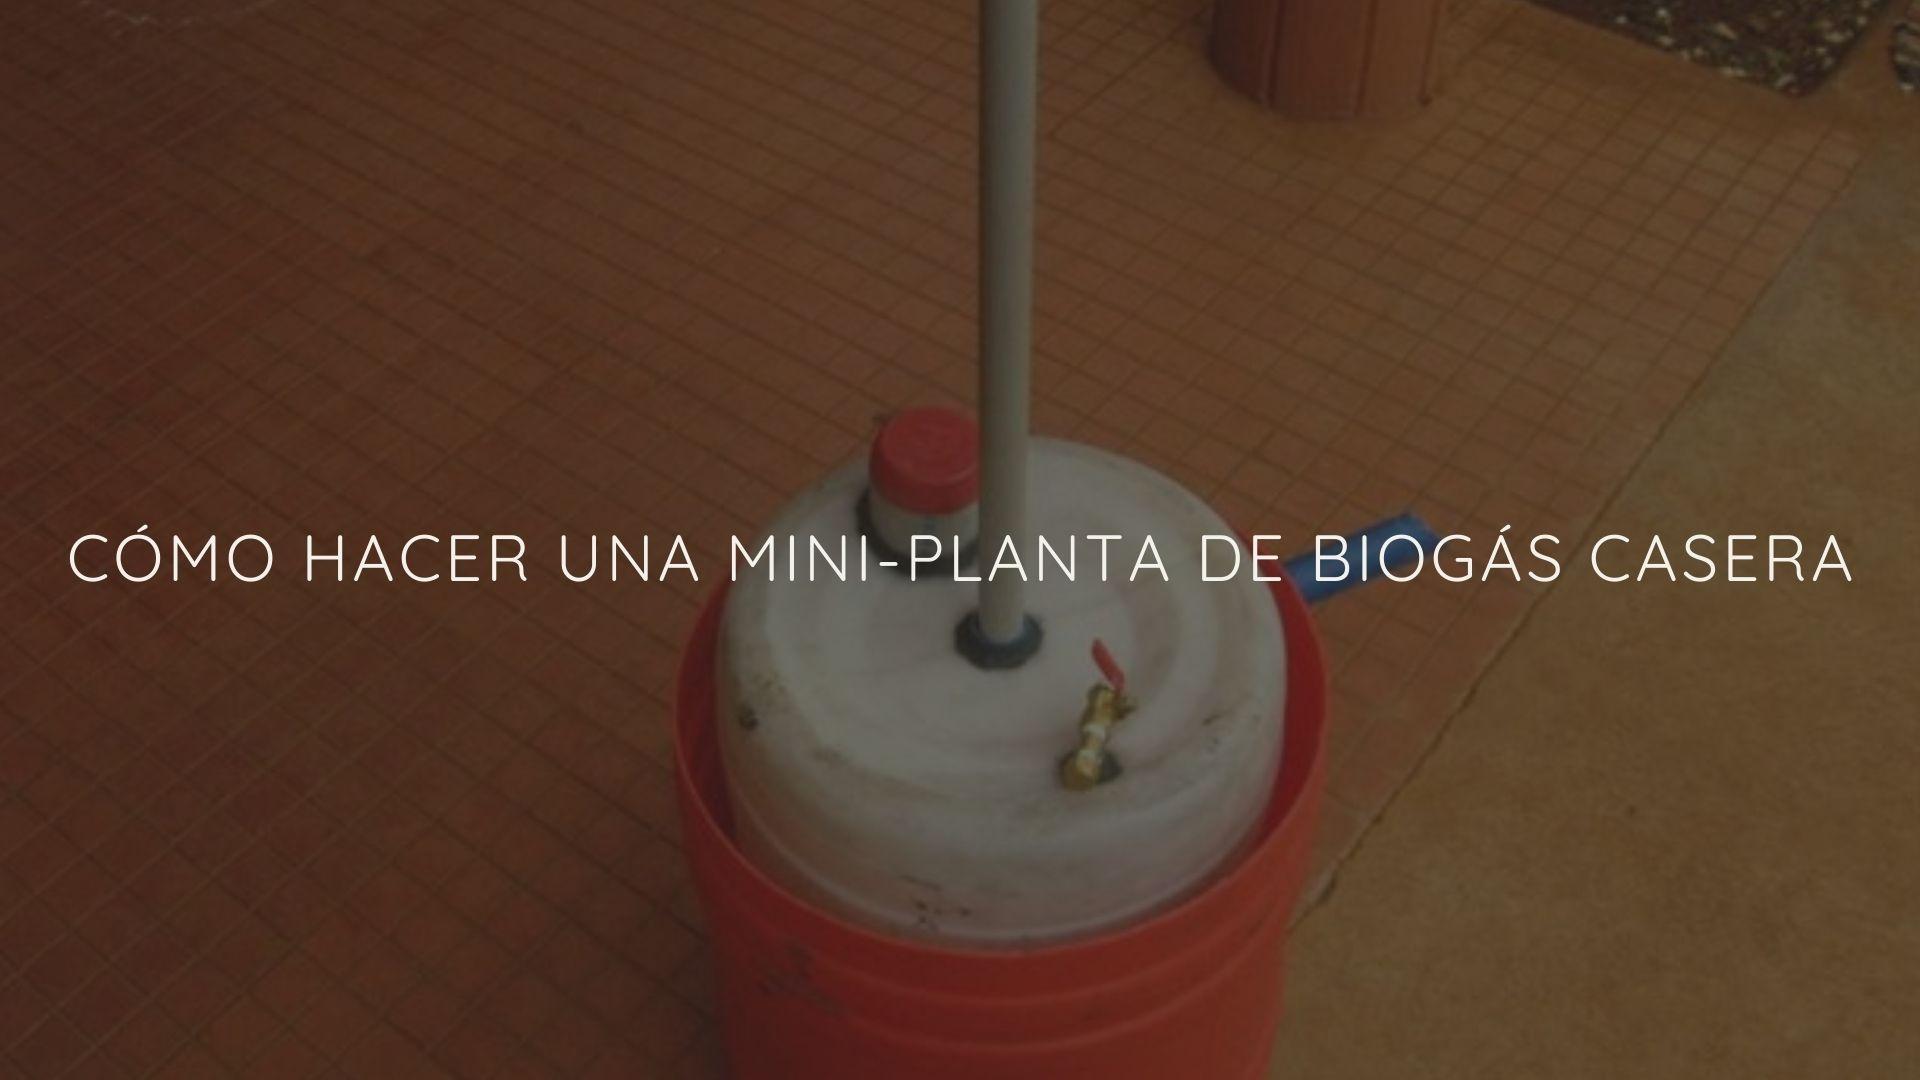 Miniplanta-biogas-casera